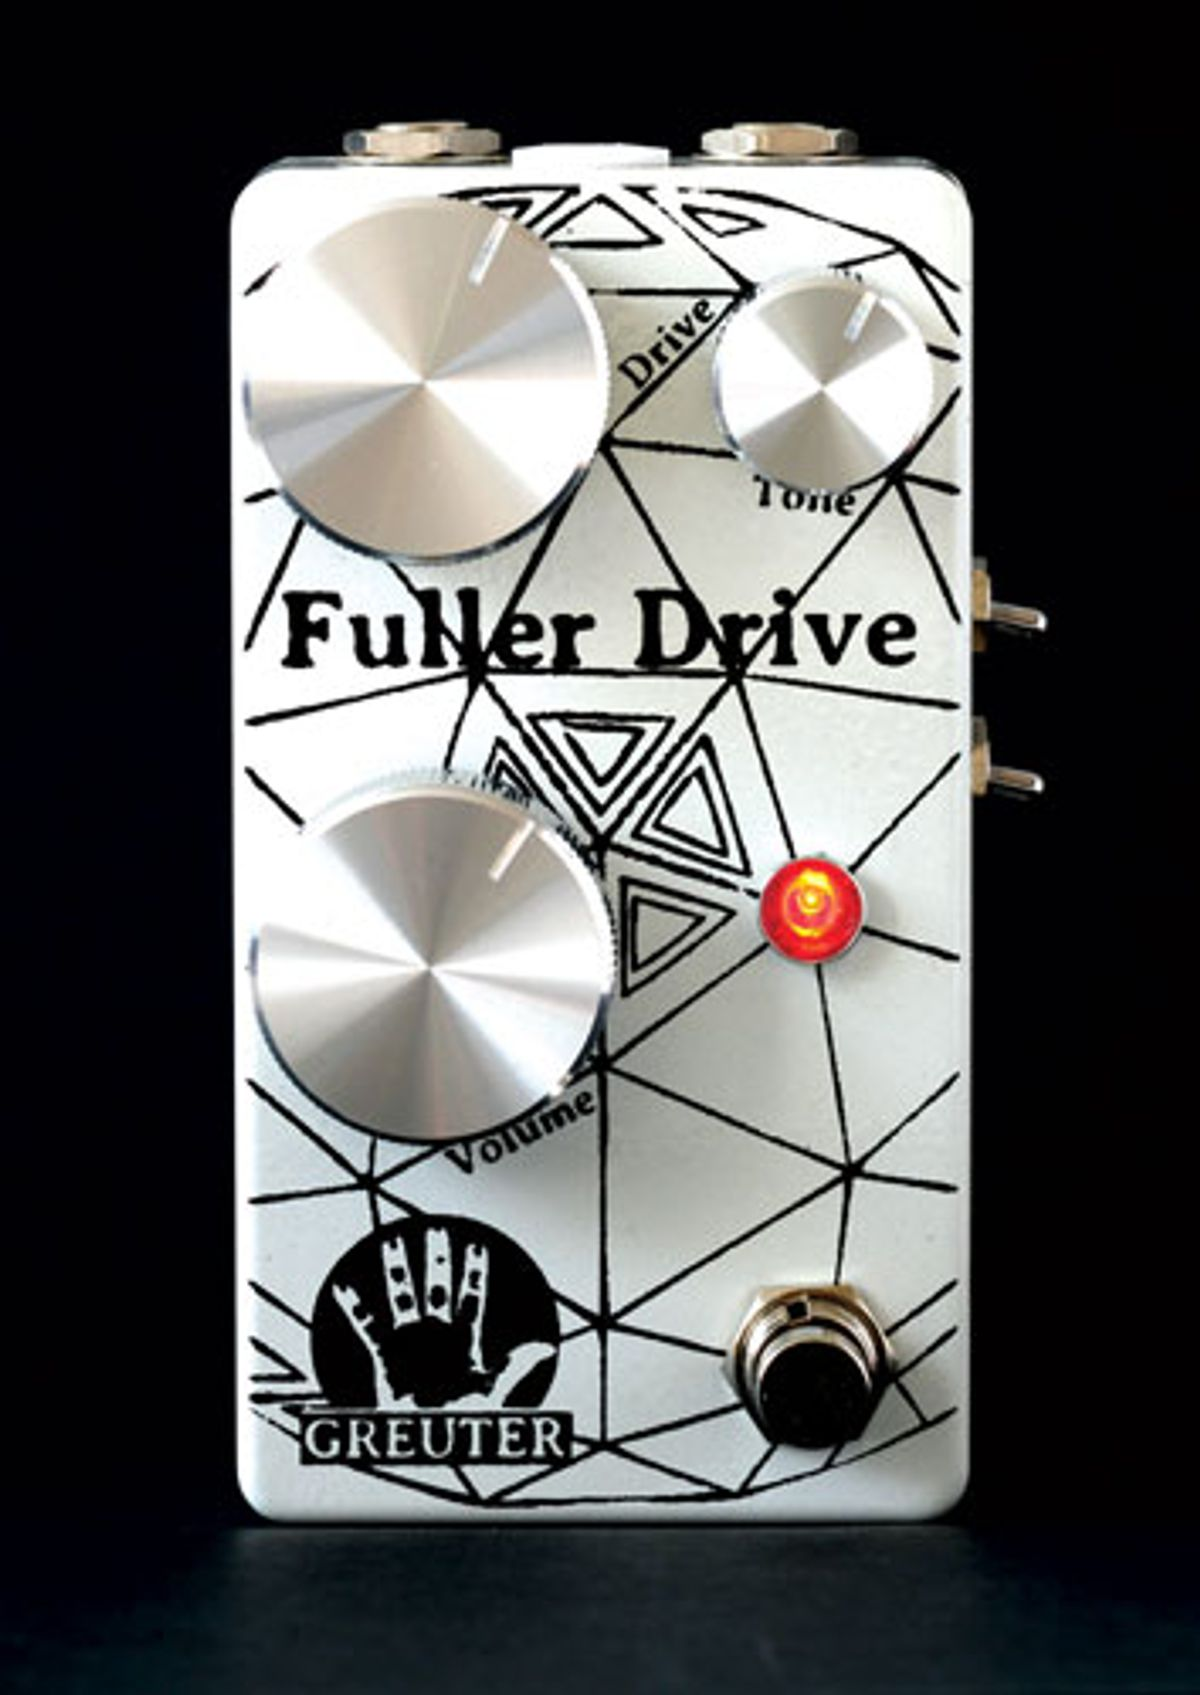 Greuter Audio Presents the Fuller Drive